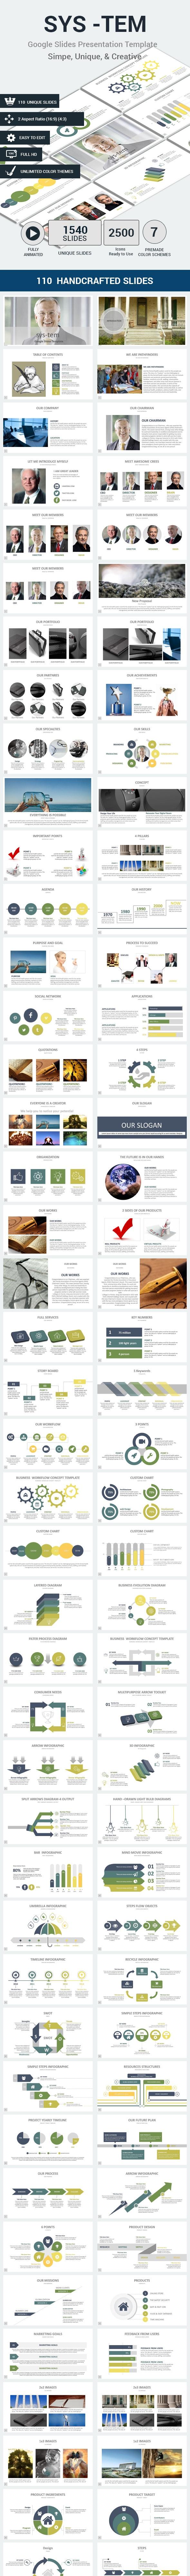 sys-tem Google Slides Presentation Template - Google Slides Presentation Templates